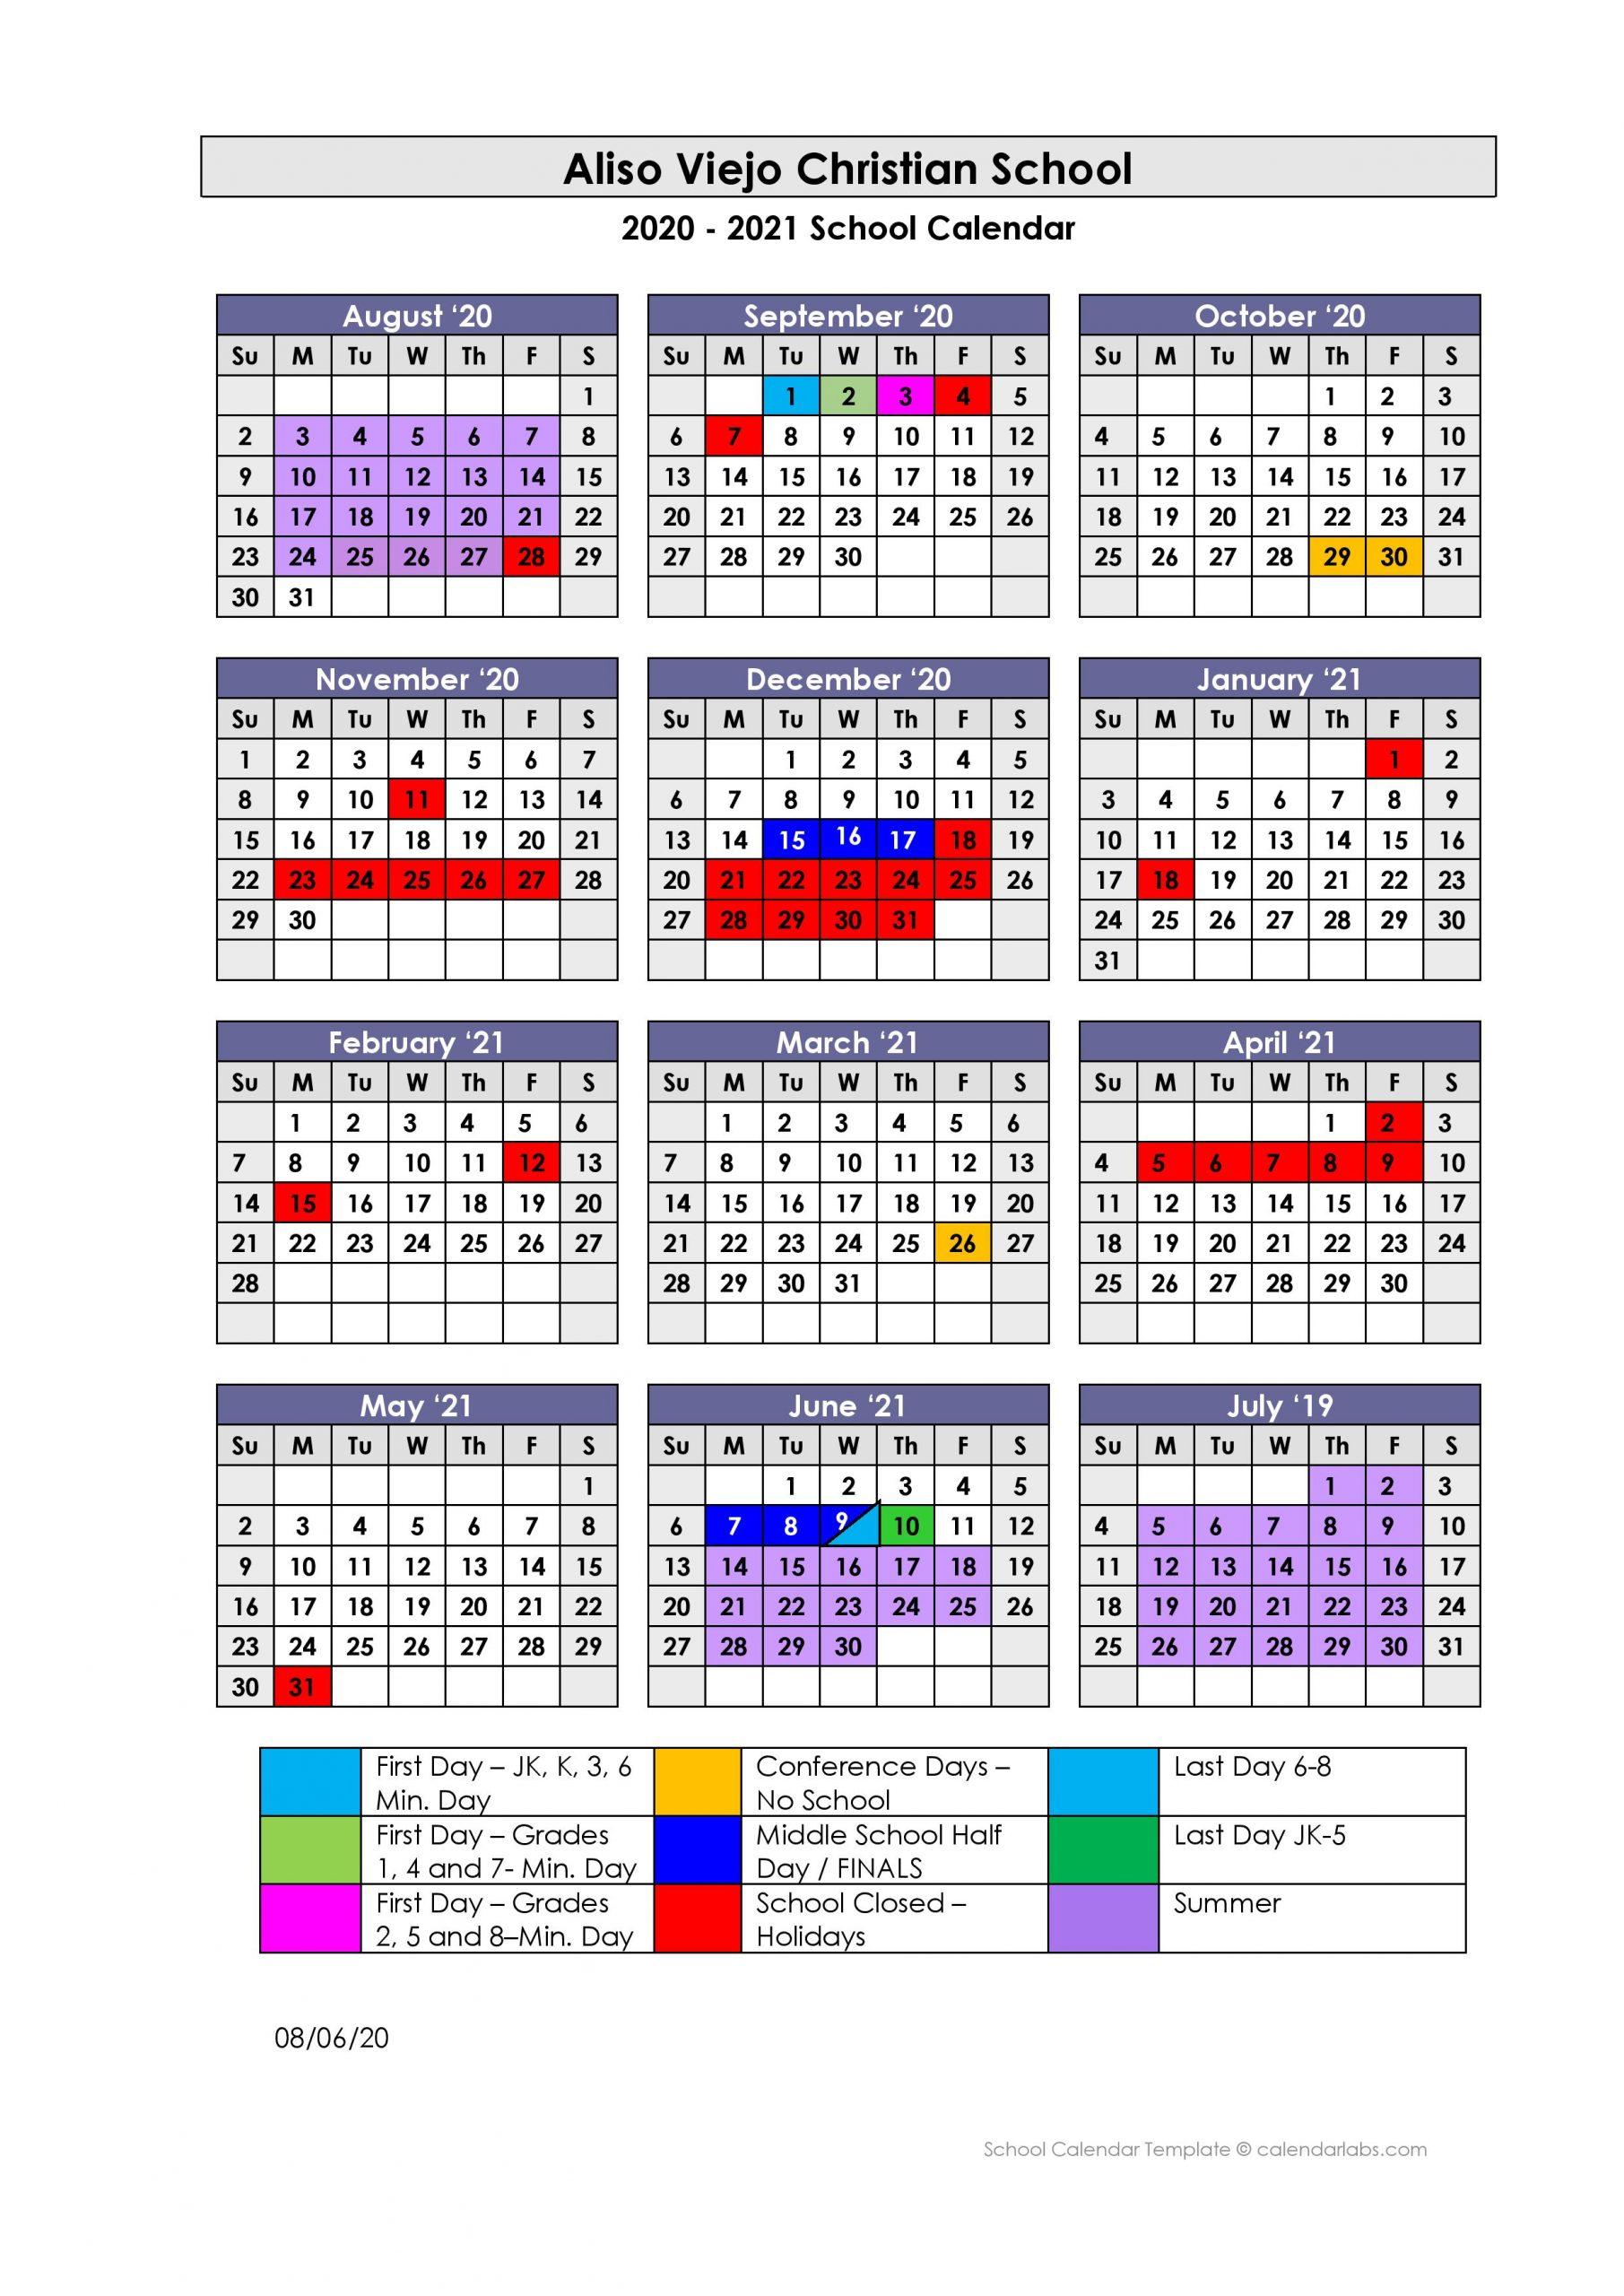 Ucsd School Calendar 2021 2020   2021 SCHOOL CALENDAR   Aliso Viejo Christian School